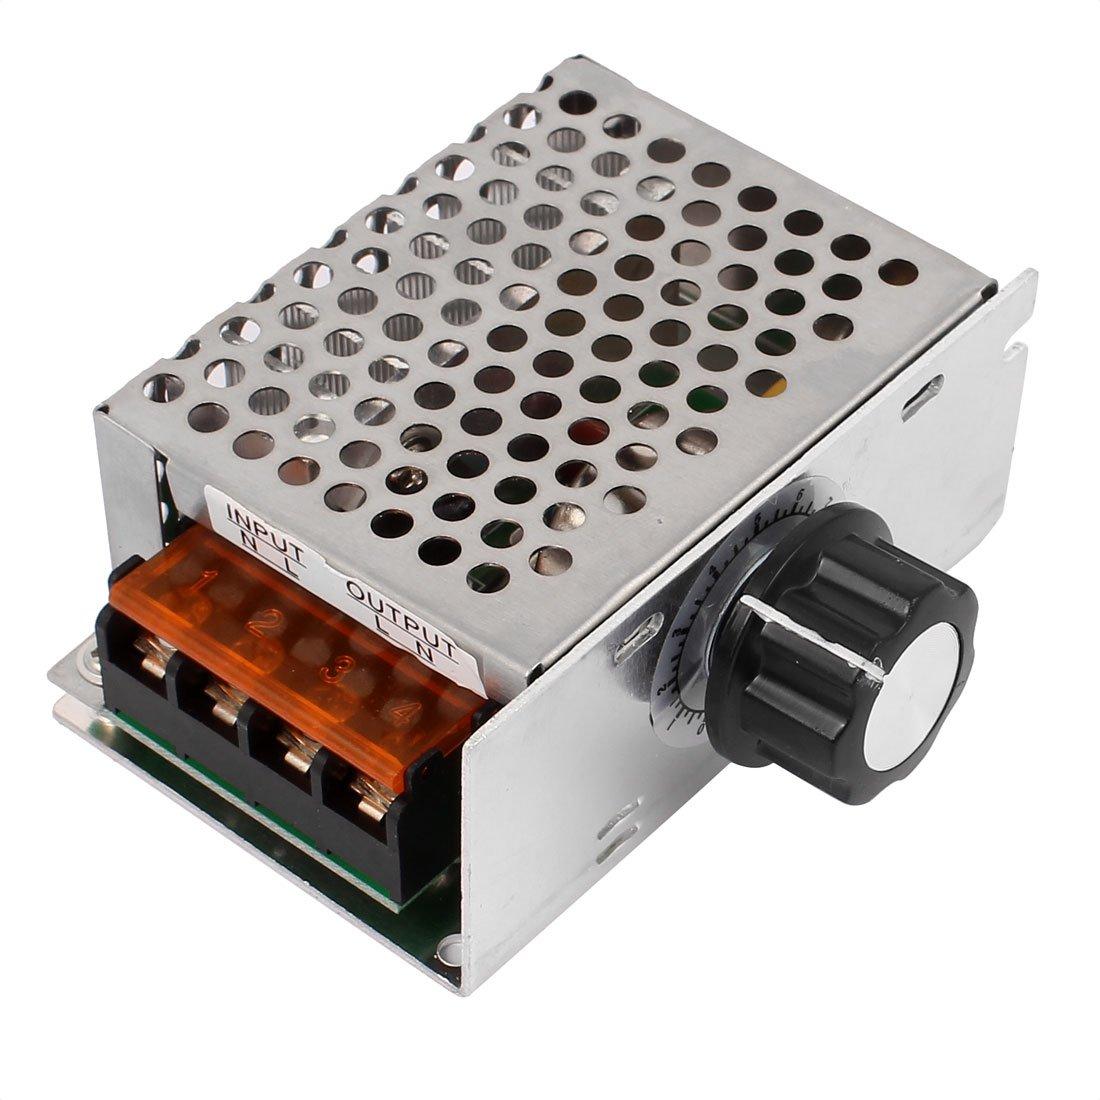 regulador de Voltaje de CA de 4000 W Regulador de Voltaje de 220 V Controlador de Temperatura de Velocidad del Motor el/éctrico BTIHCEUOT Controlador de Velocidad del Motor